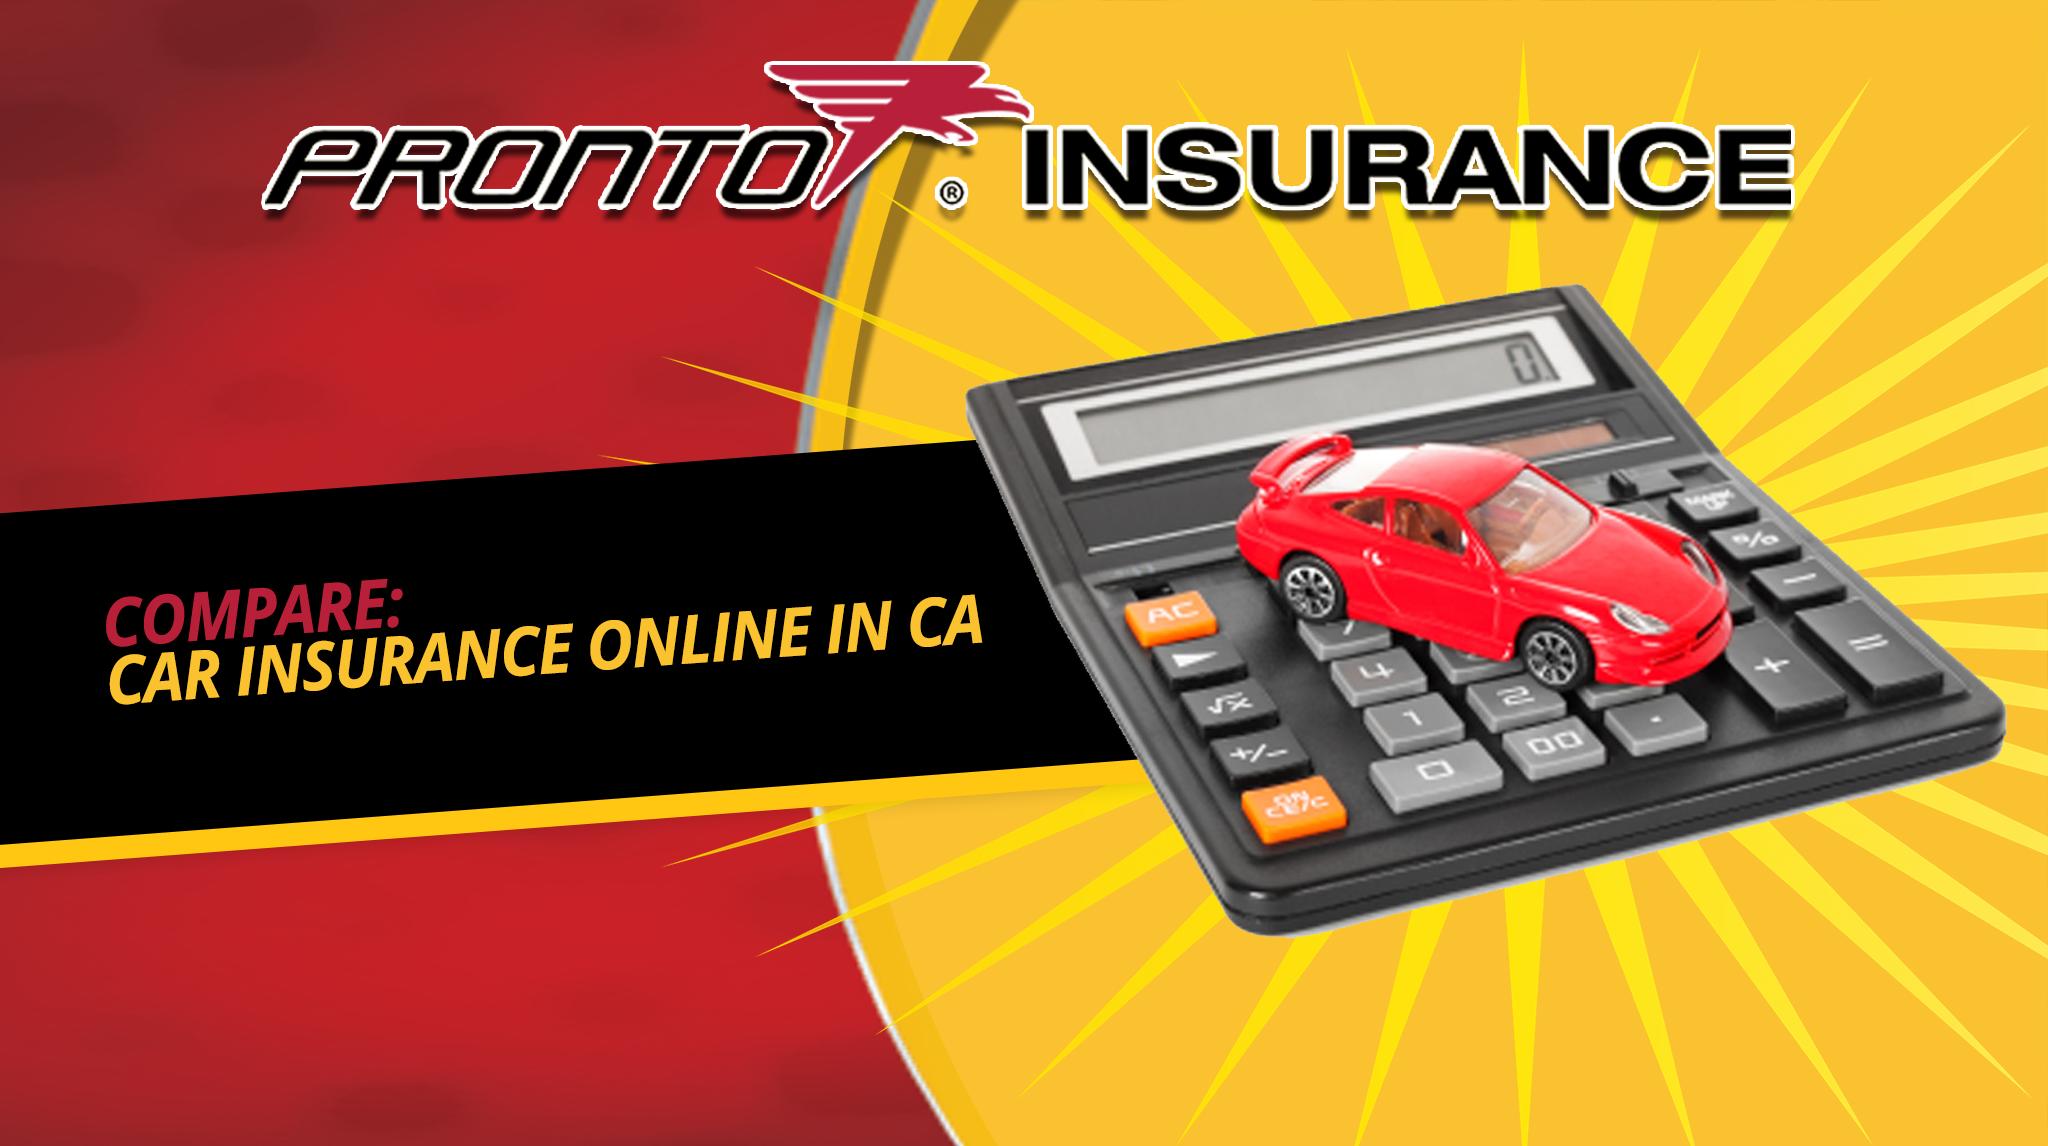 Compare Car Insurance Online in CA